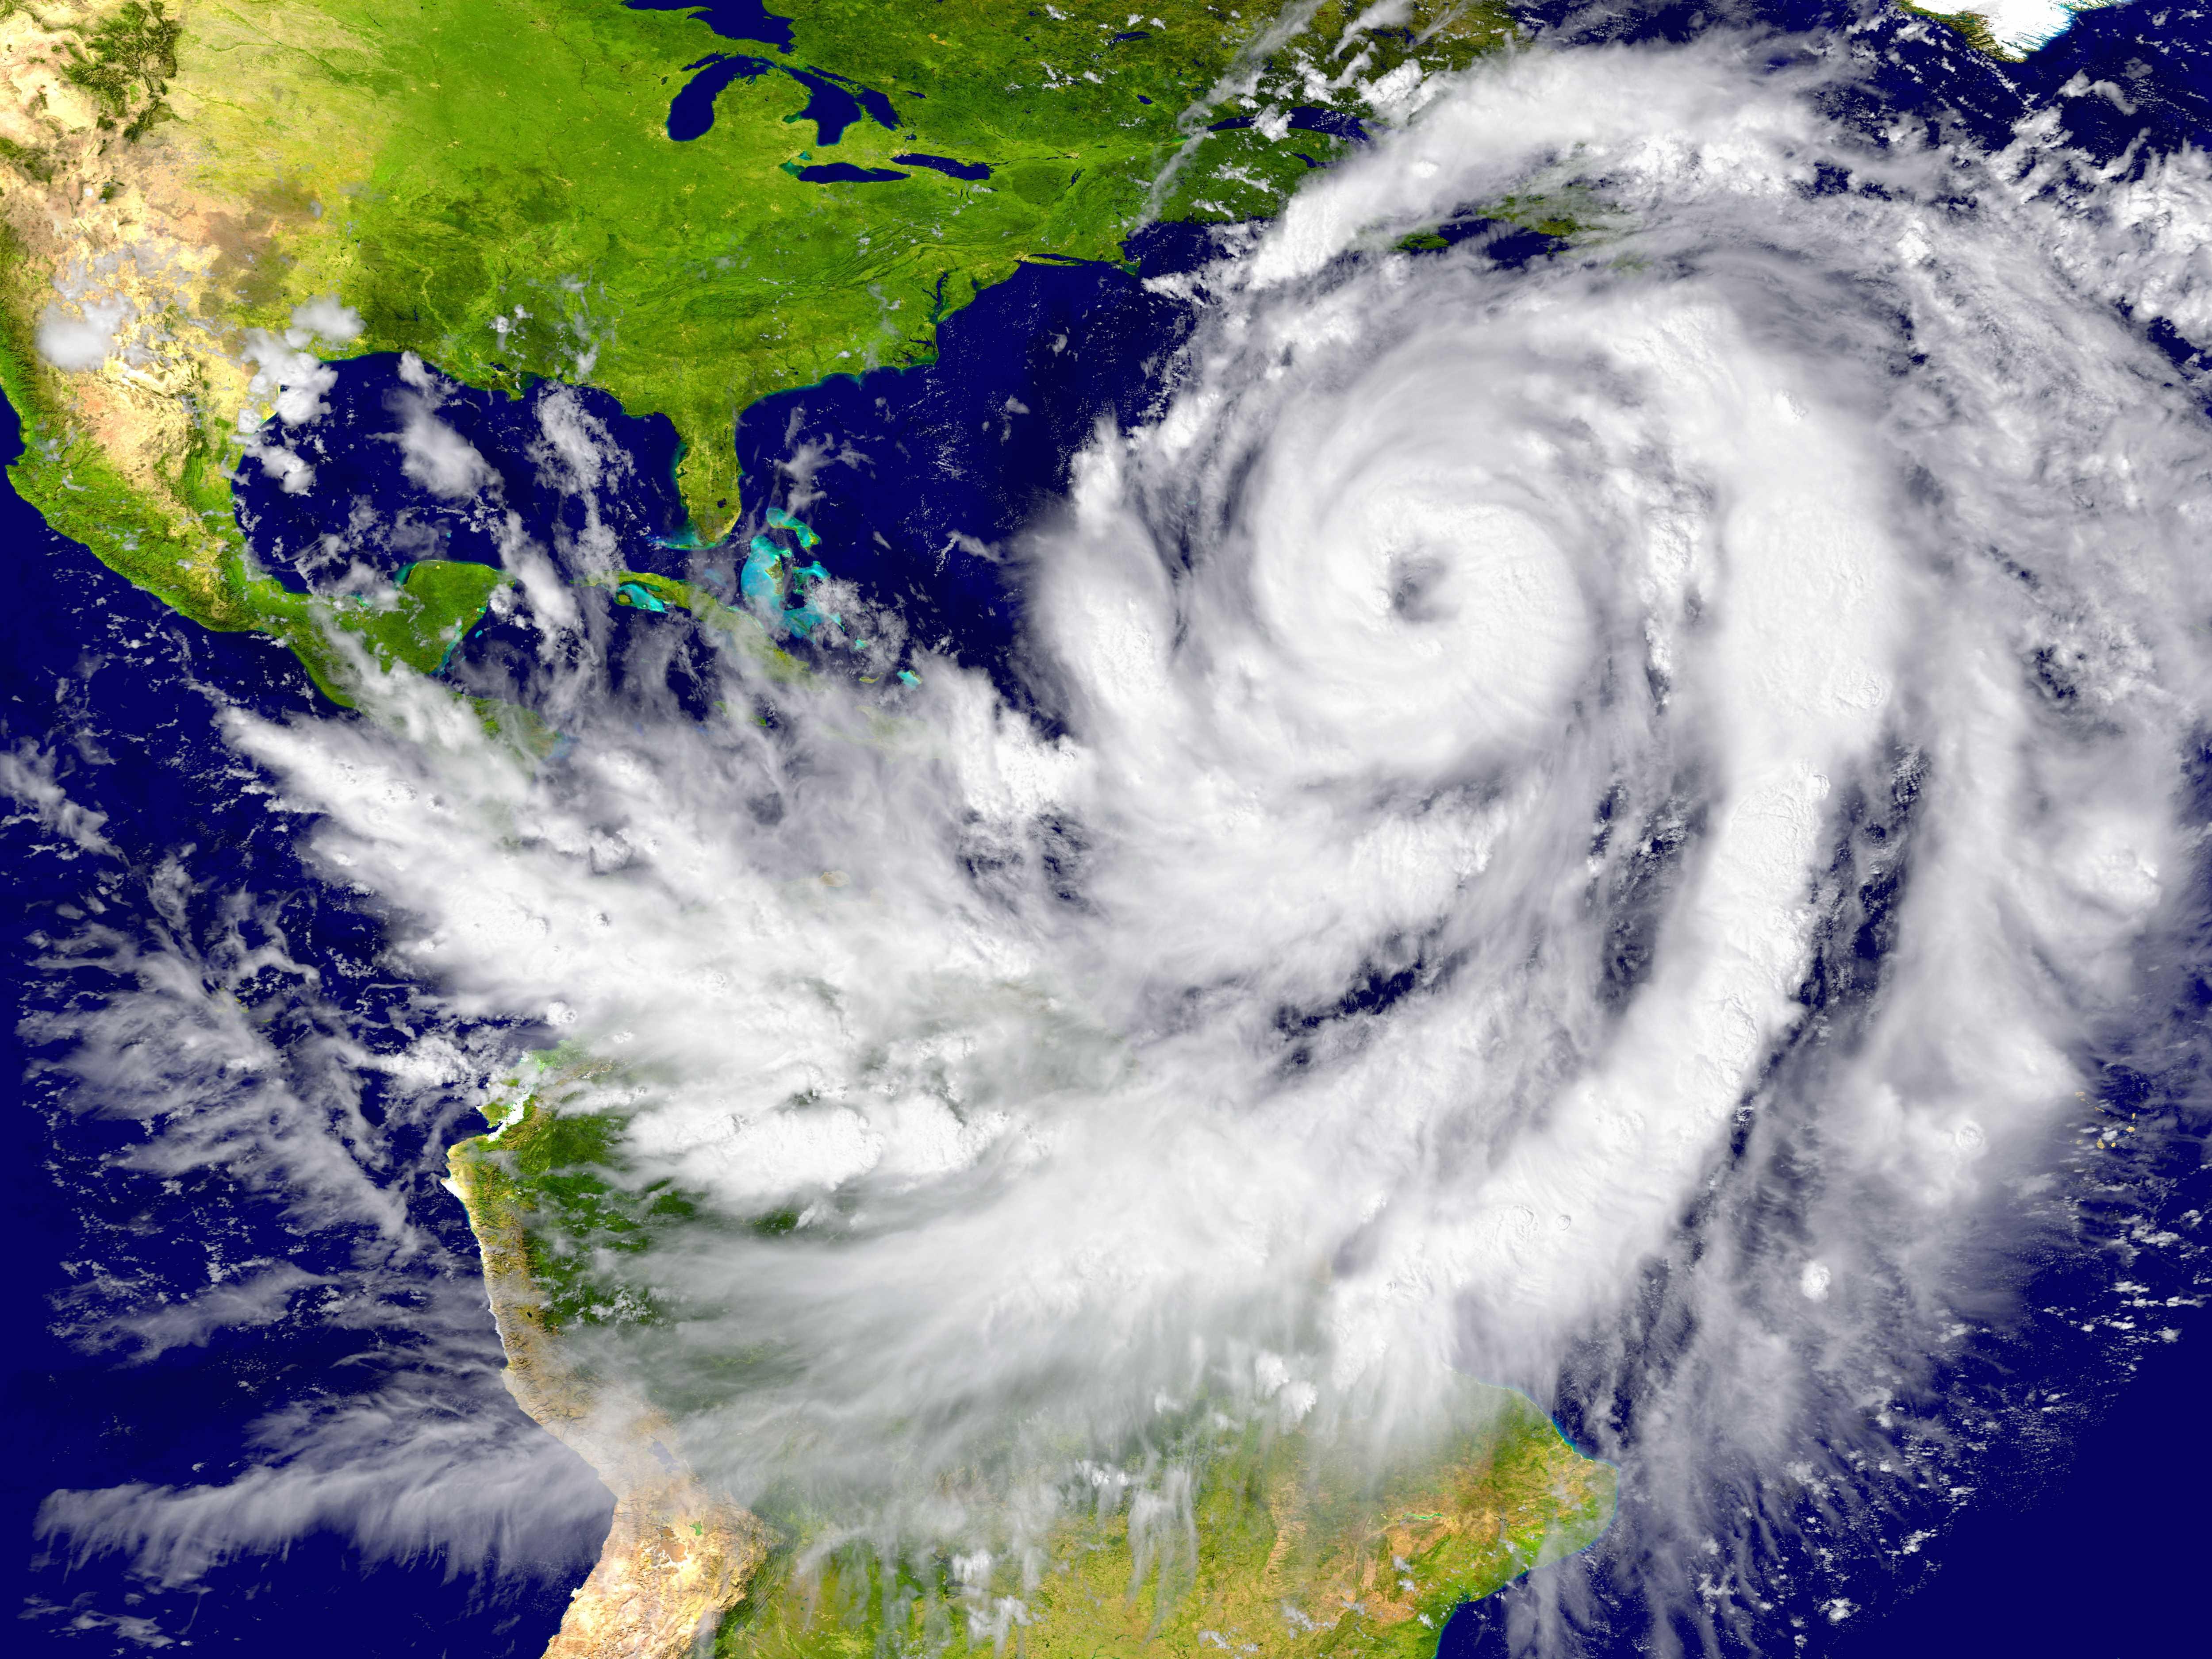 Active hurricane season likely